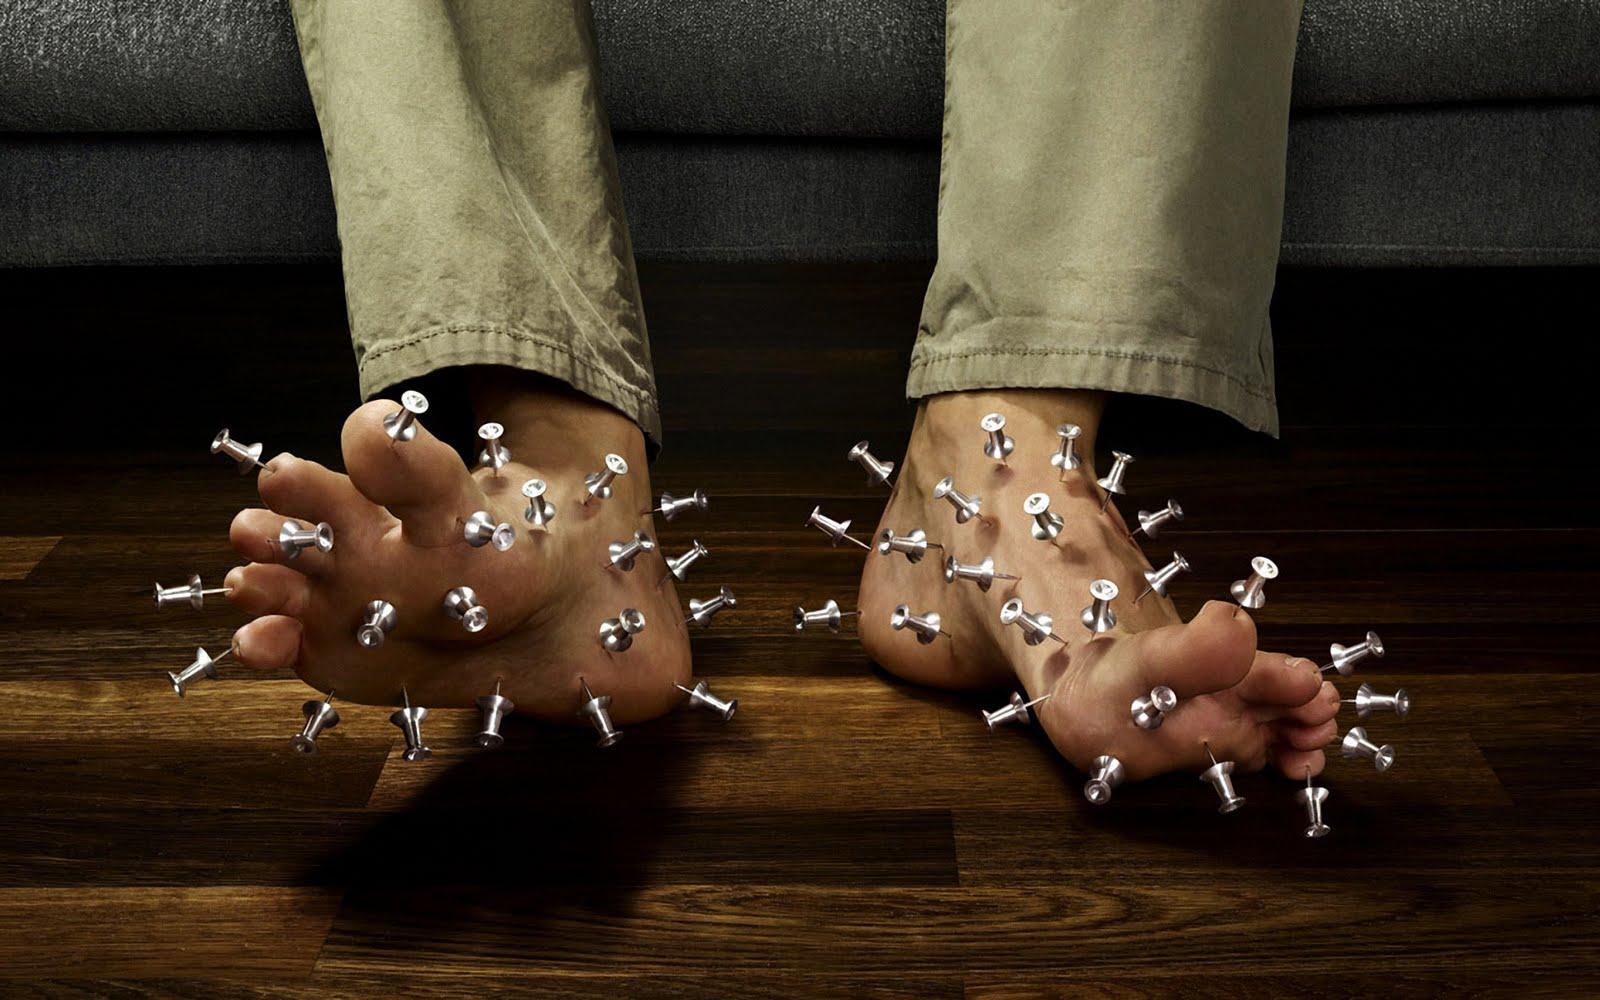 http://4.bp.blogspot.com/-hZW_NasDSEc/TijxC4J0VII/AAAAAAAADgc/7bJZ1I-2RFg/s1600/Hurt+Feet+Wallpaper.jpeg